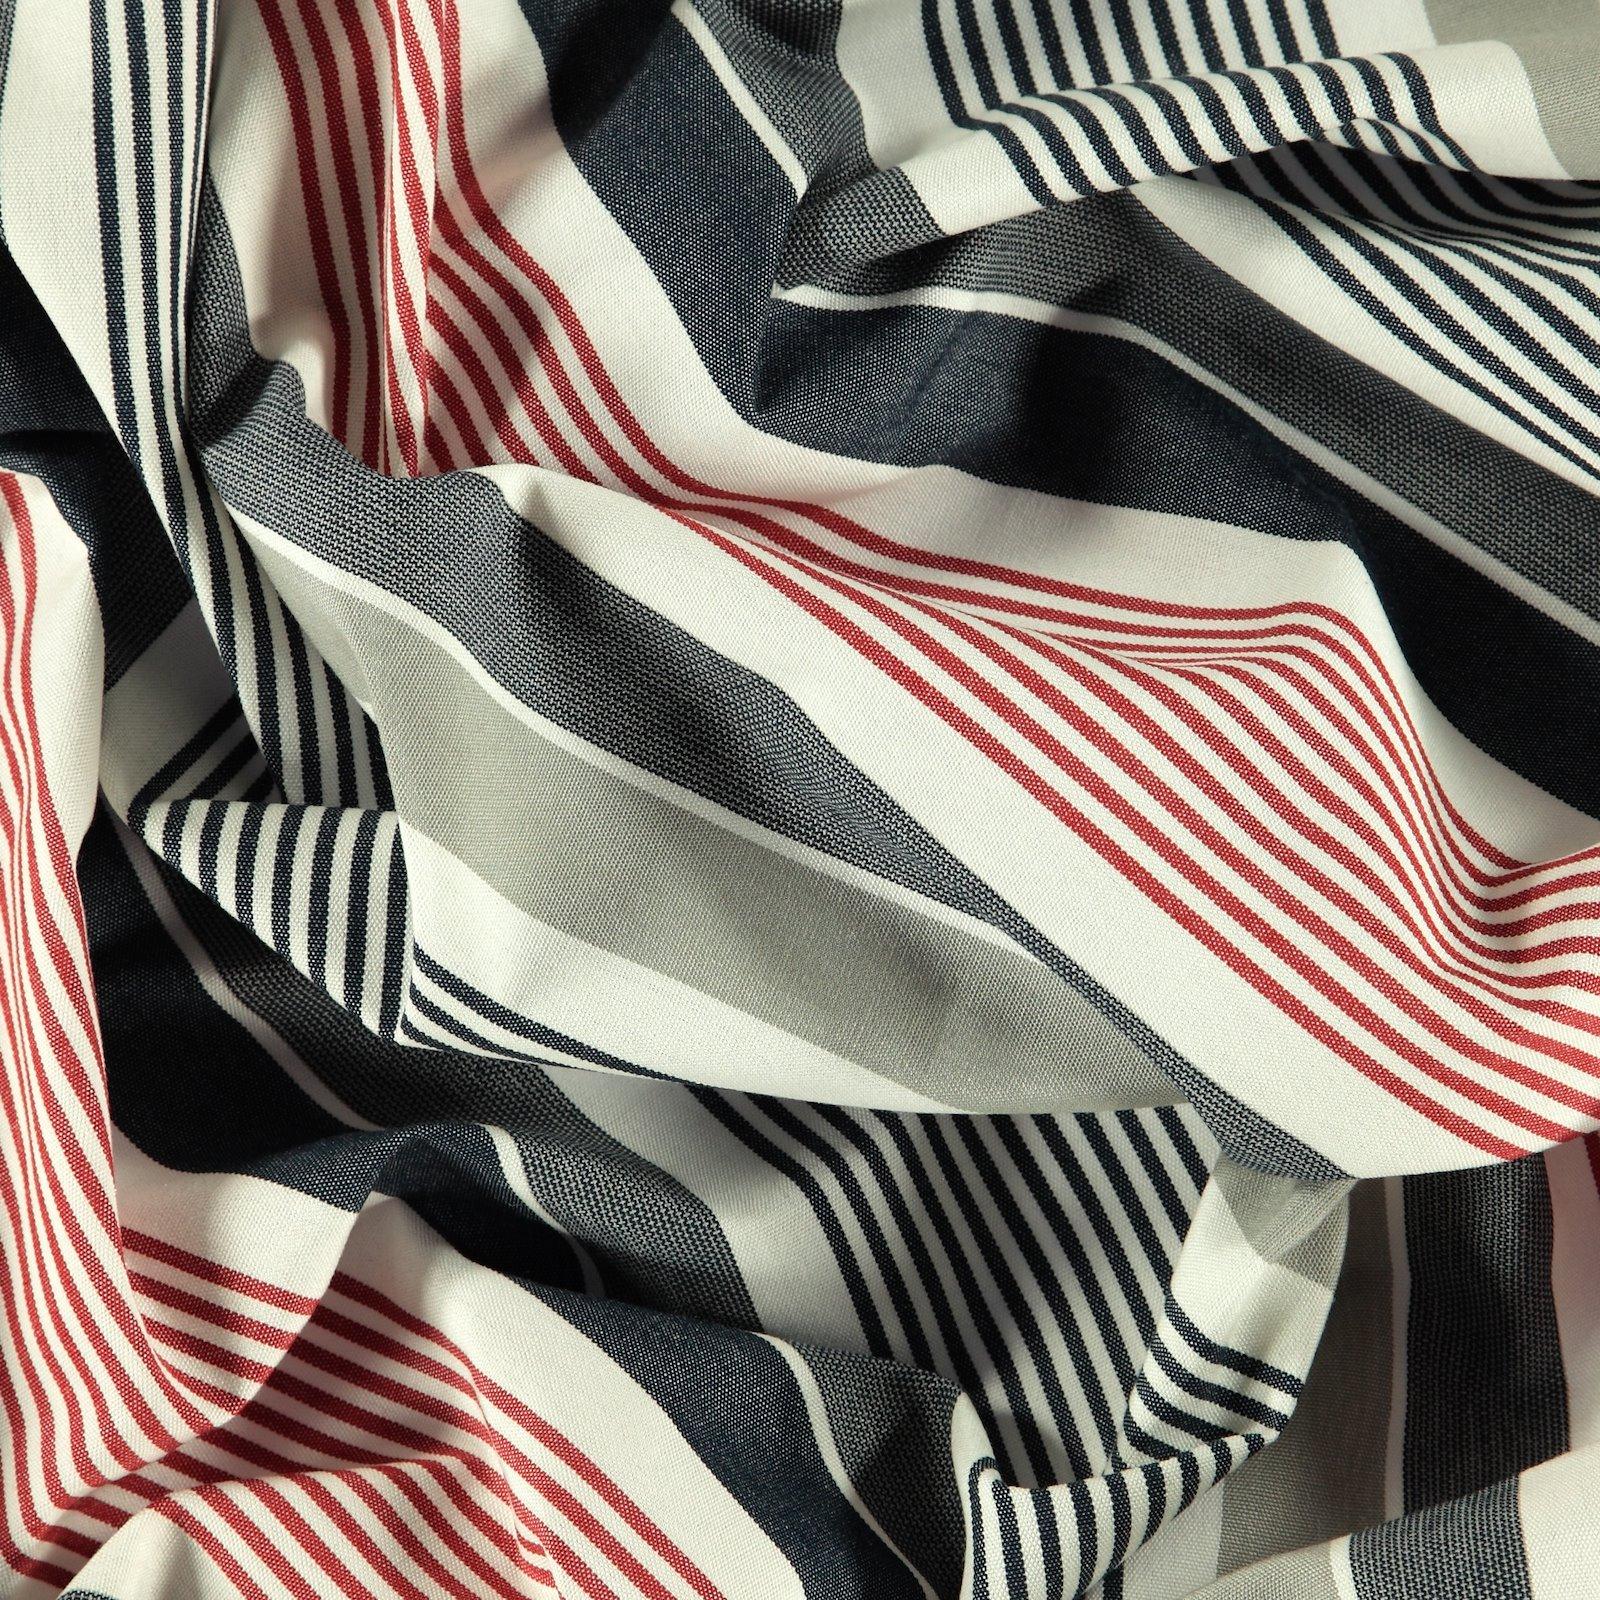 Dralon maritime striped Teflon coated